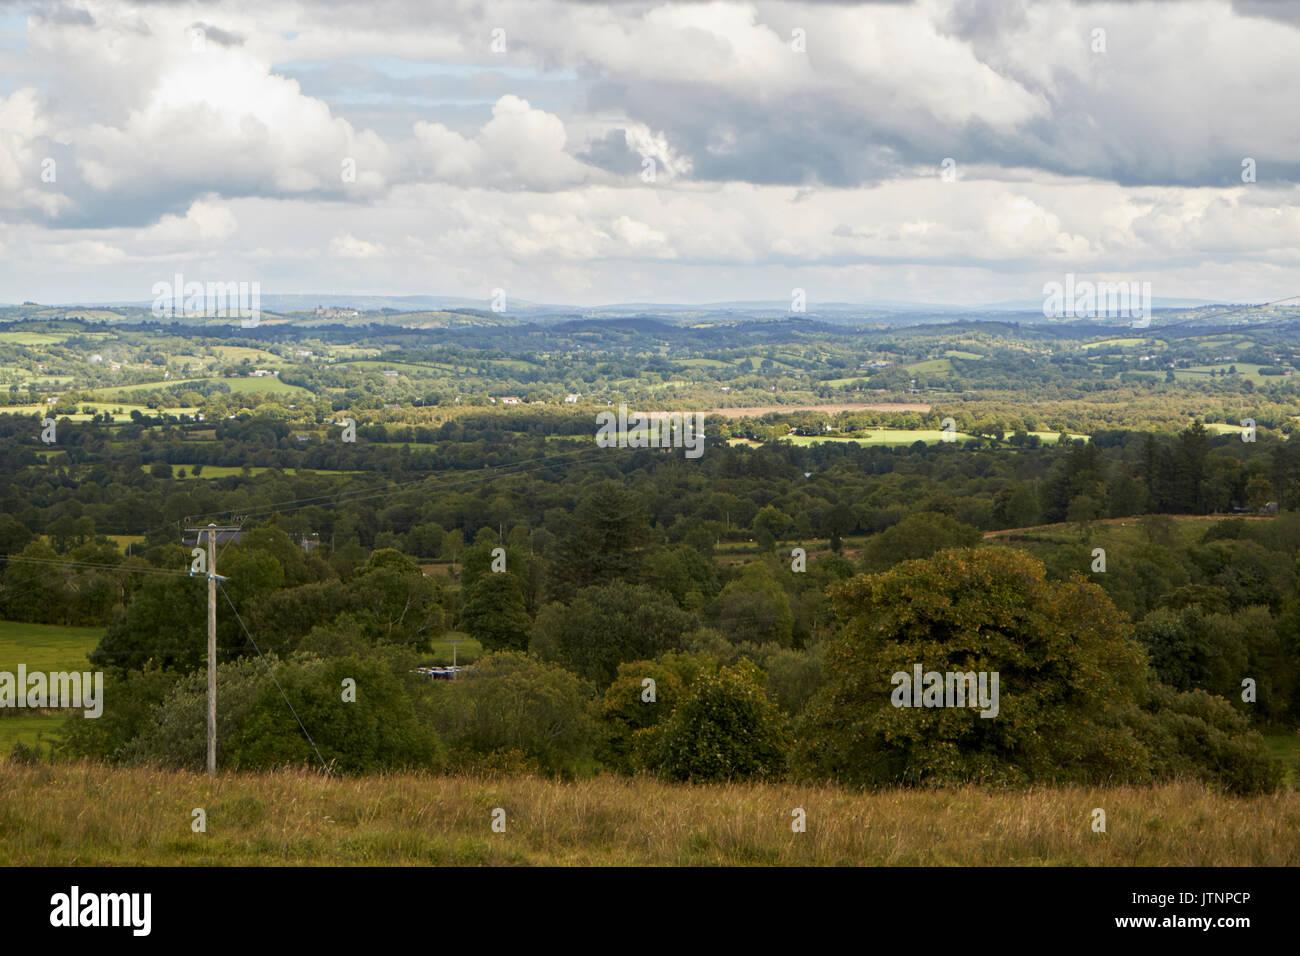 county fermanagh countryside near the irish border northern ireland - Stock Image